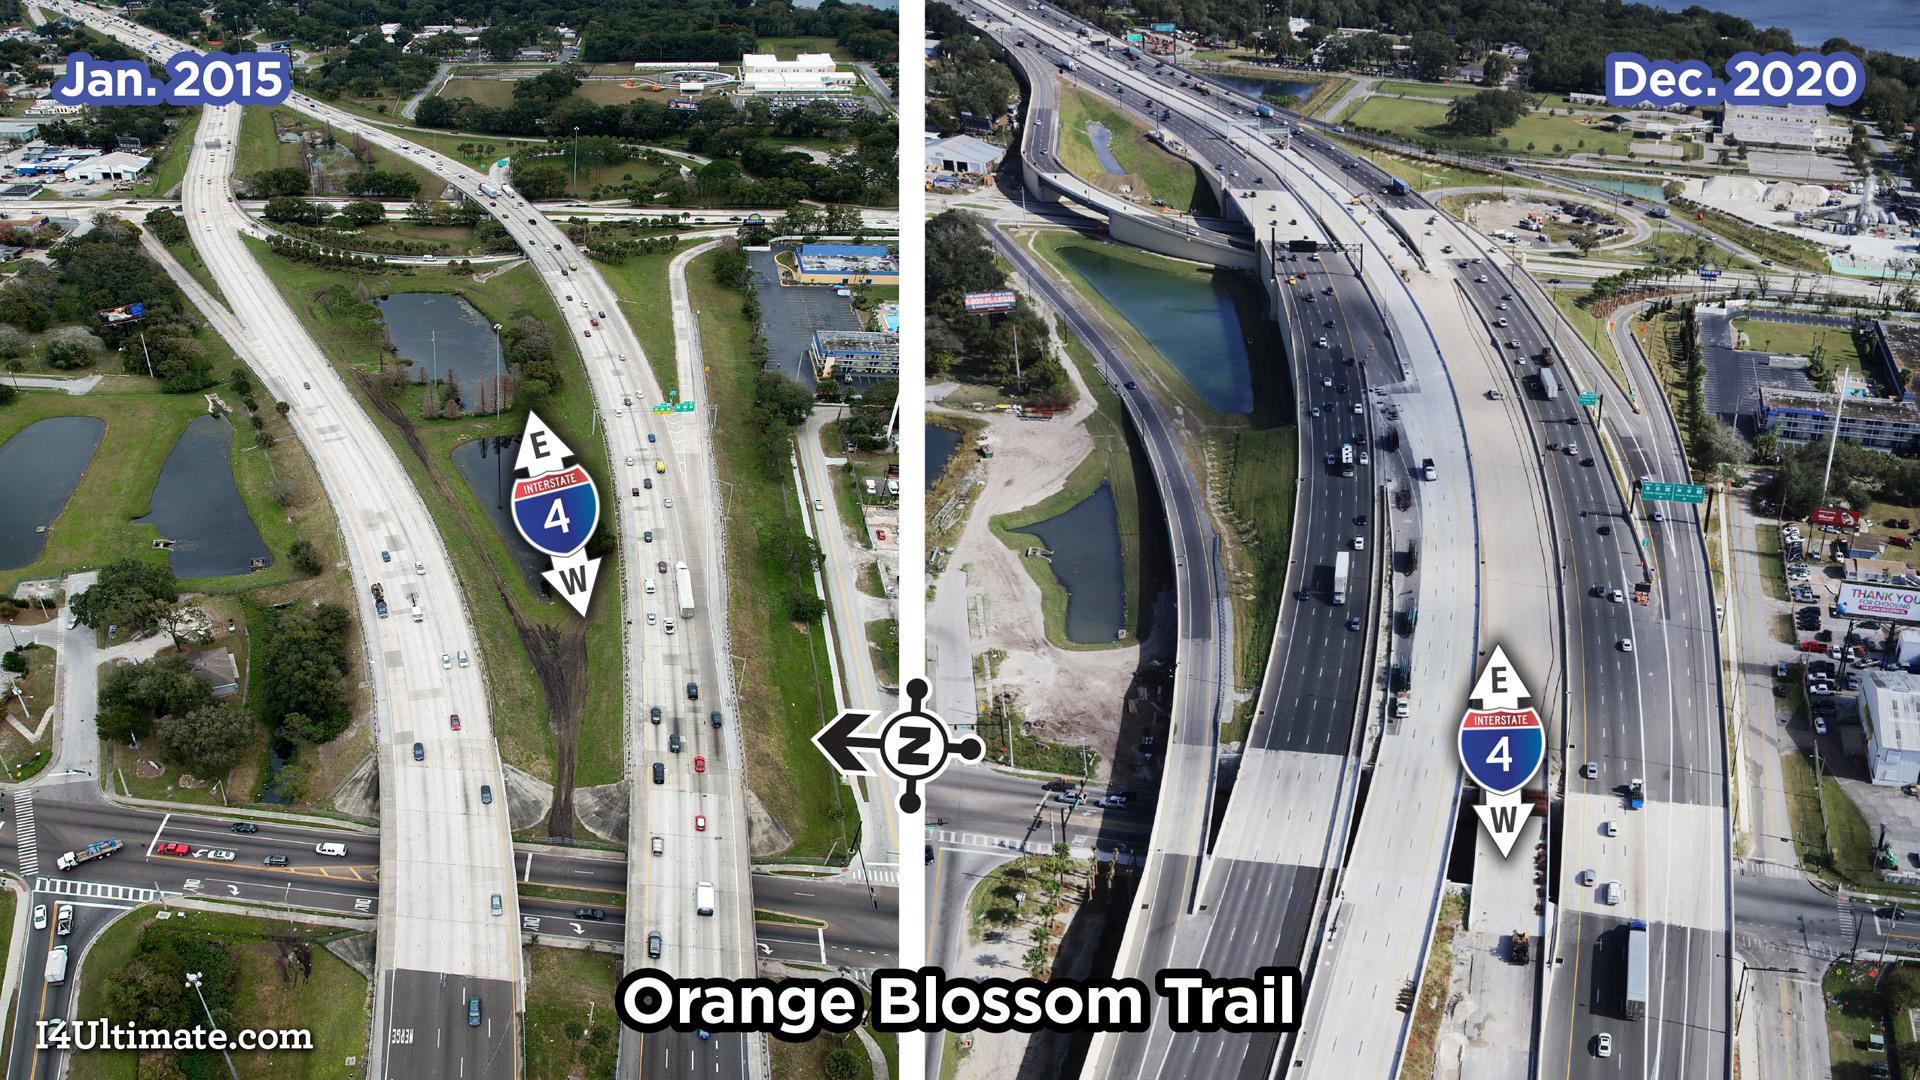 4738-I4Ultimate-GUL-campaign-images-20210212-07-Orange-Blossom-Trail